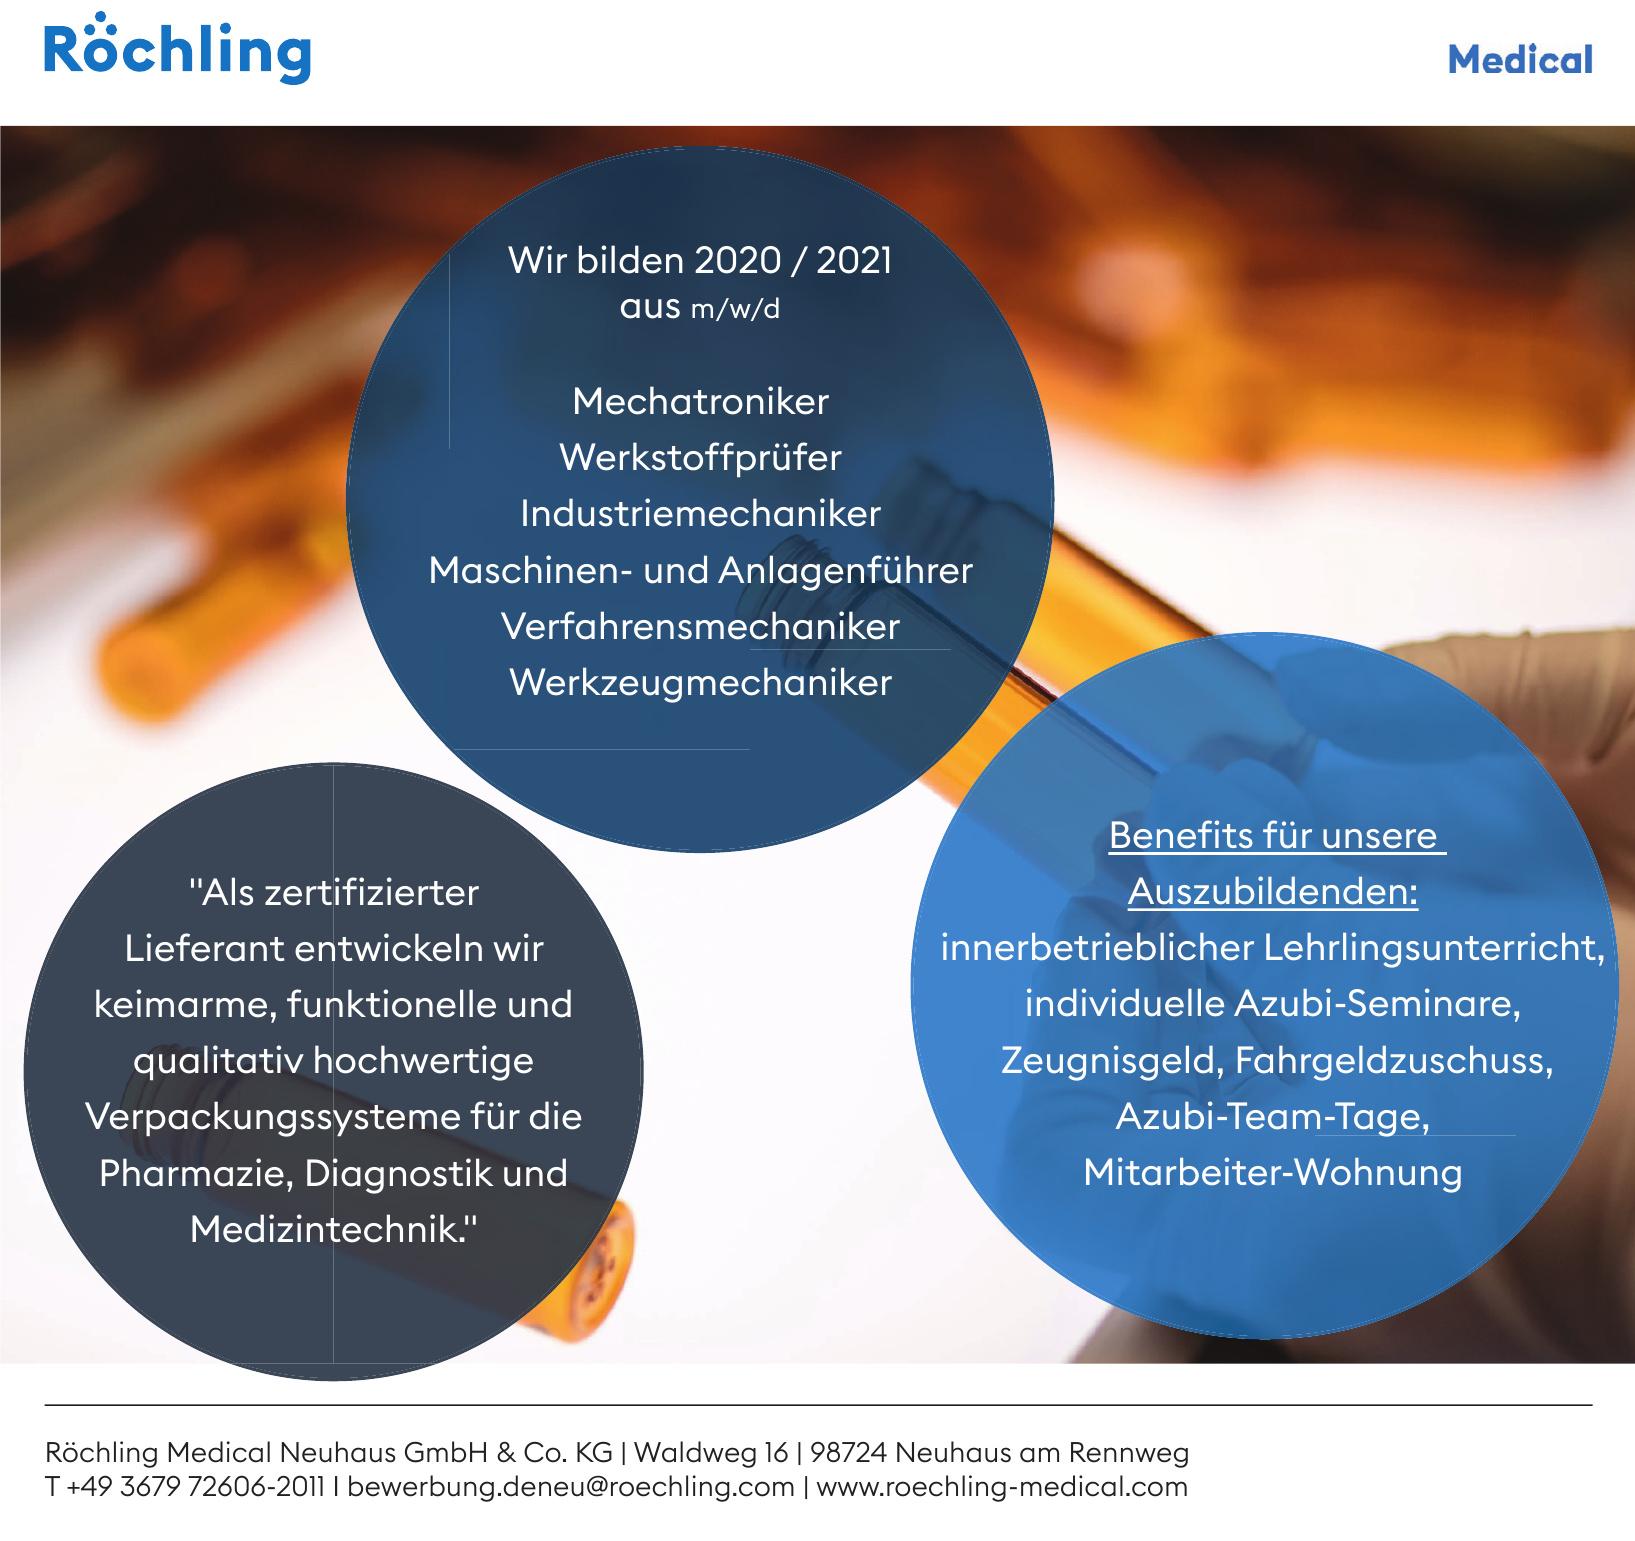 Röchling Medical Neuhaus GmbH & Co. KG